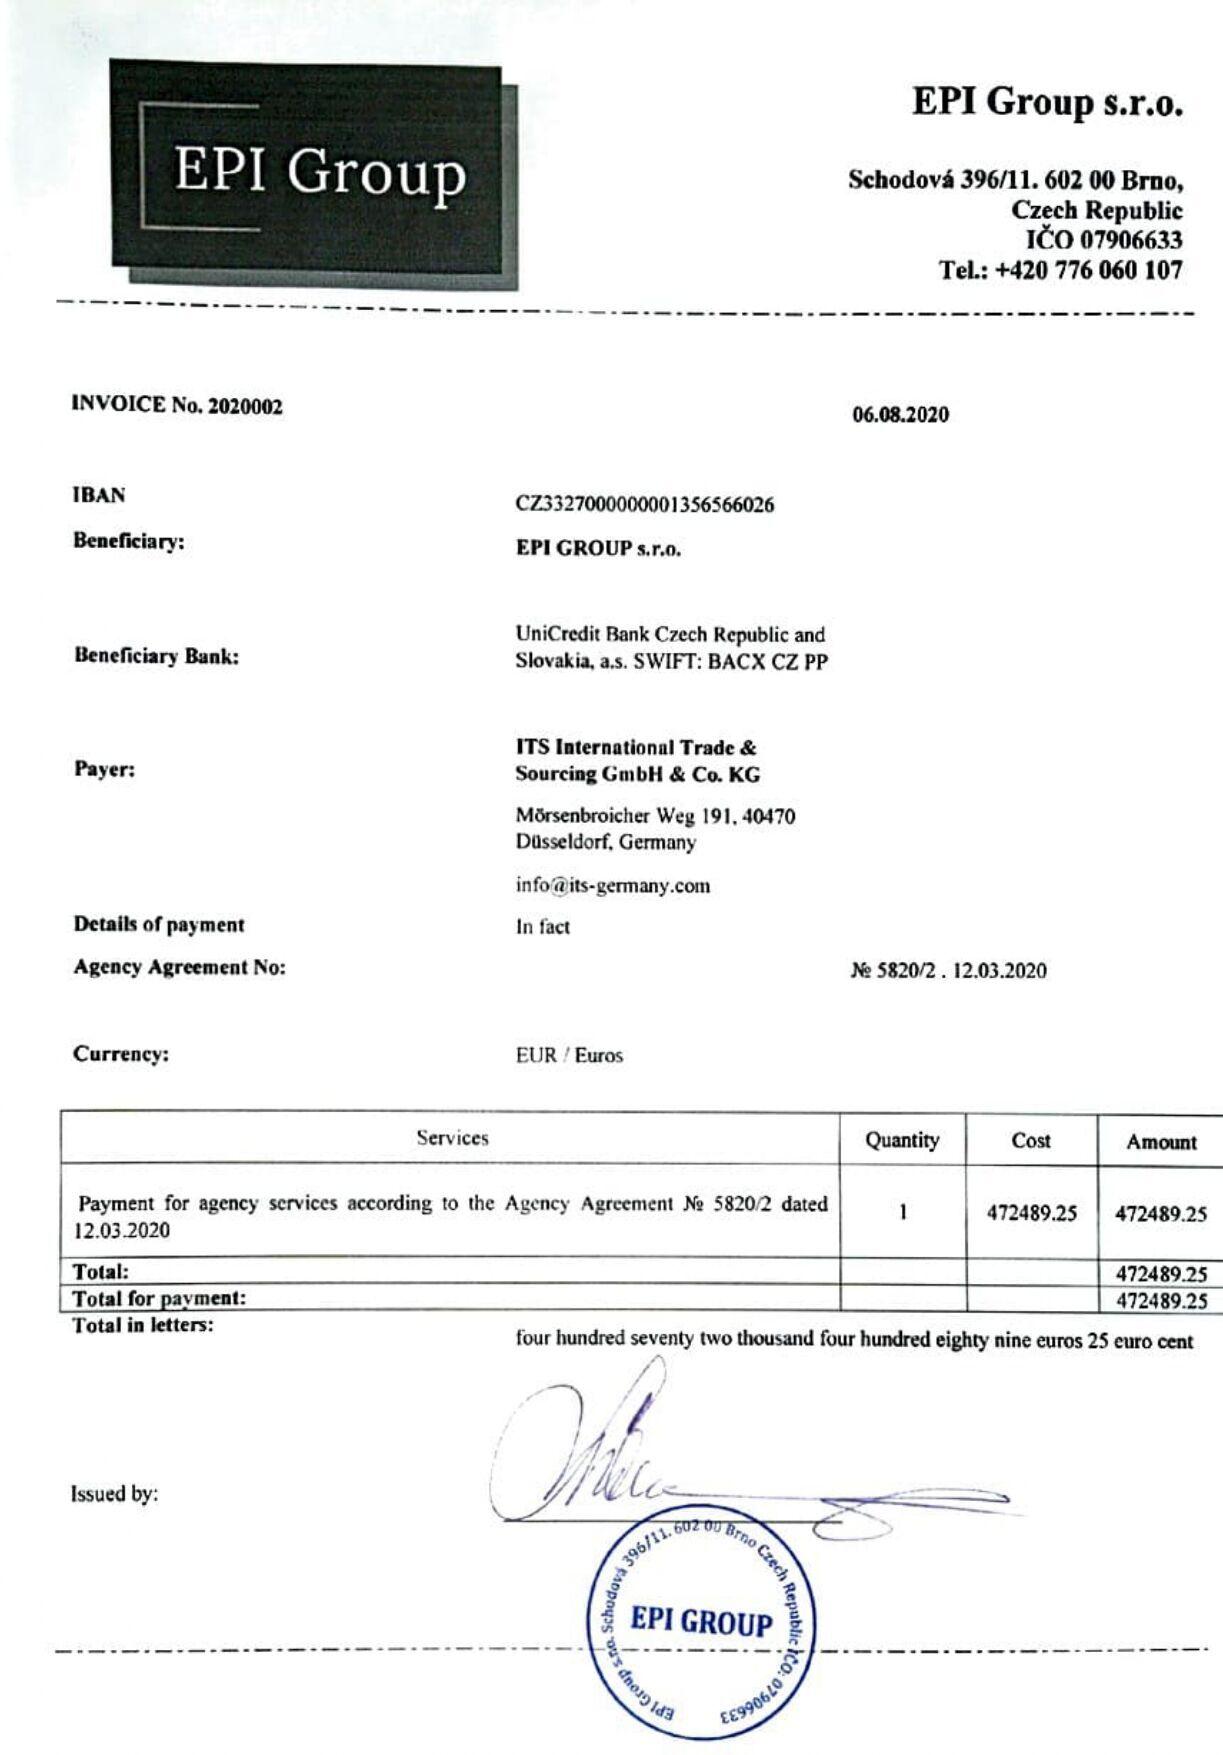 EPI Group получила EUR 472,89 тыс. от немецкой ITS International Trade через чешский UniCredit Bank